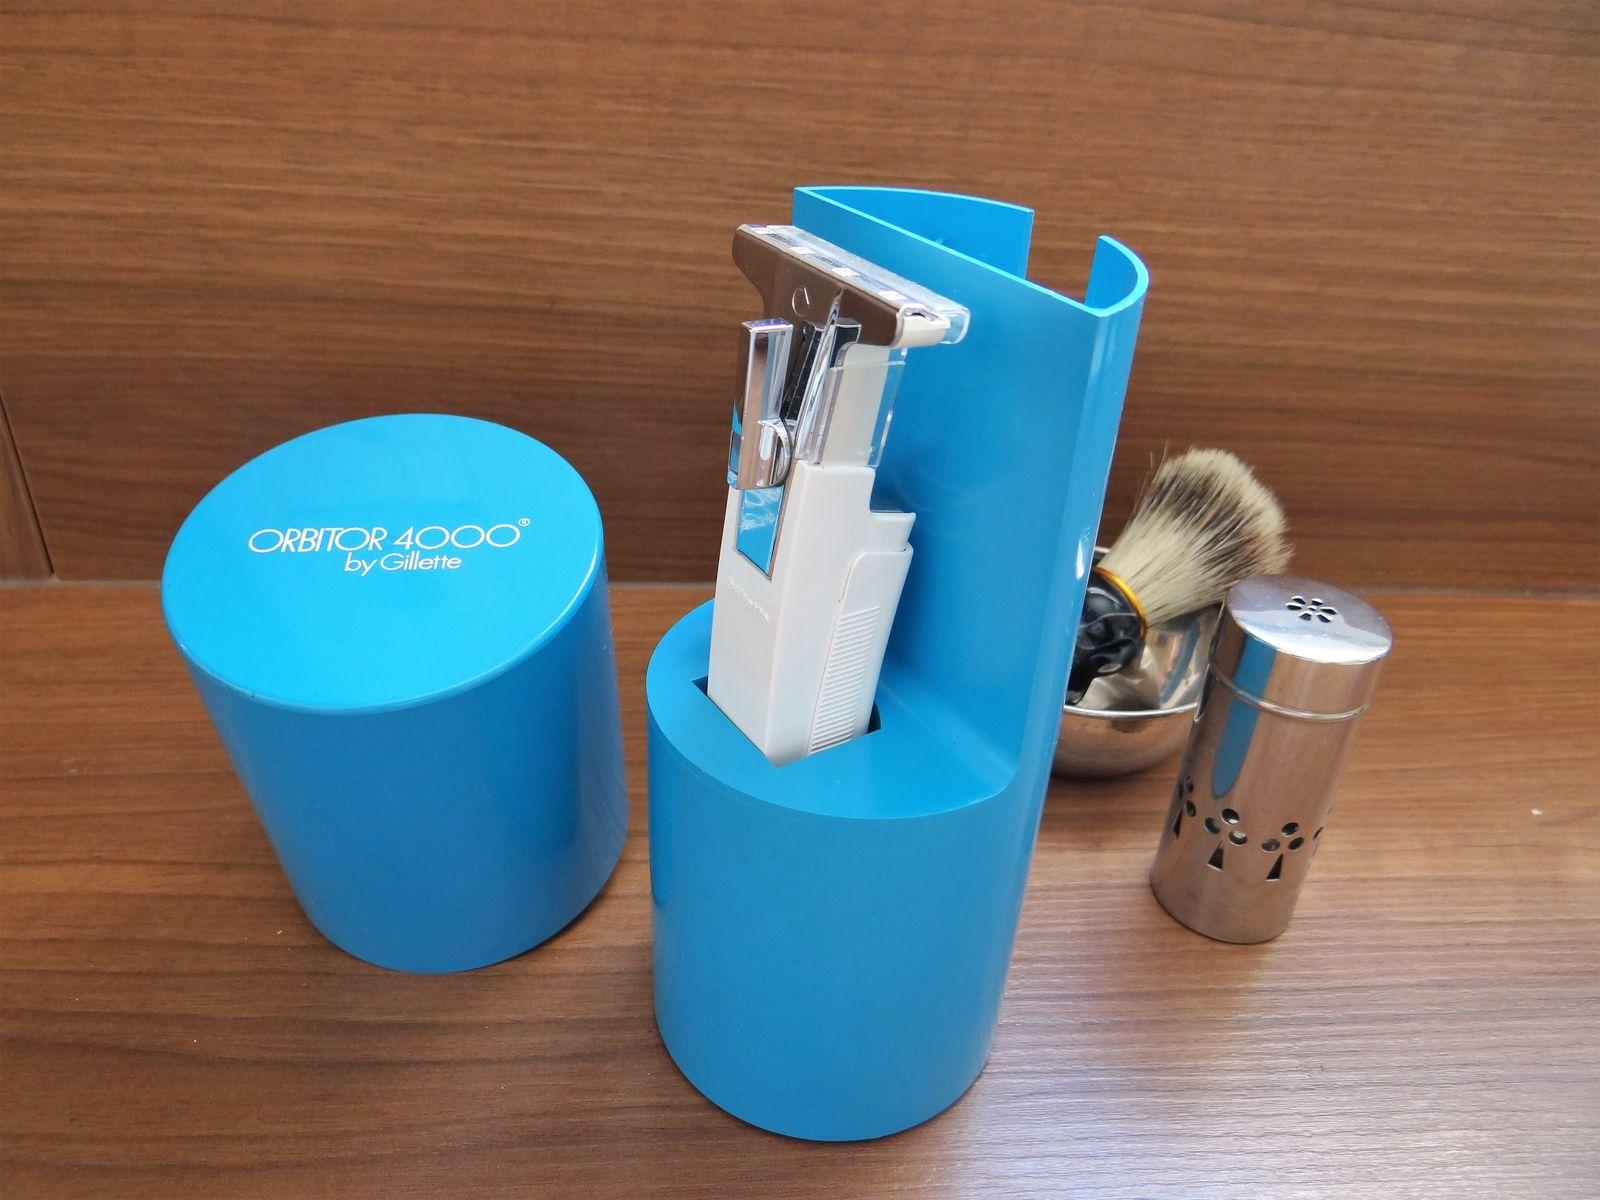 Gillette Orbitor 4000